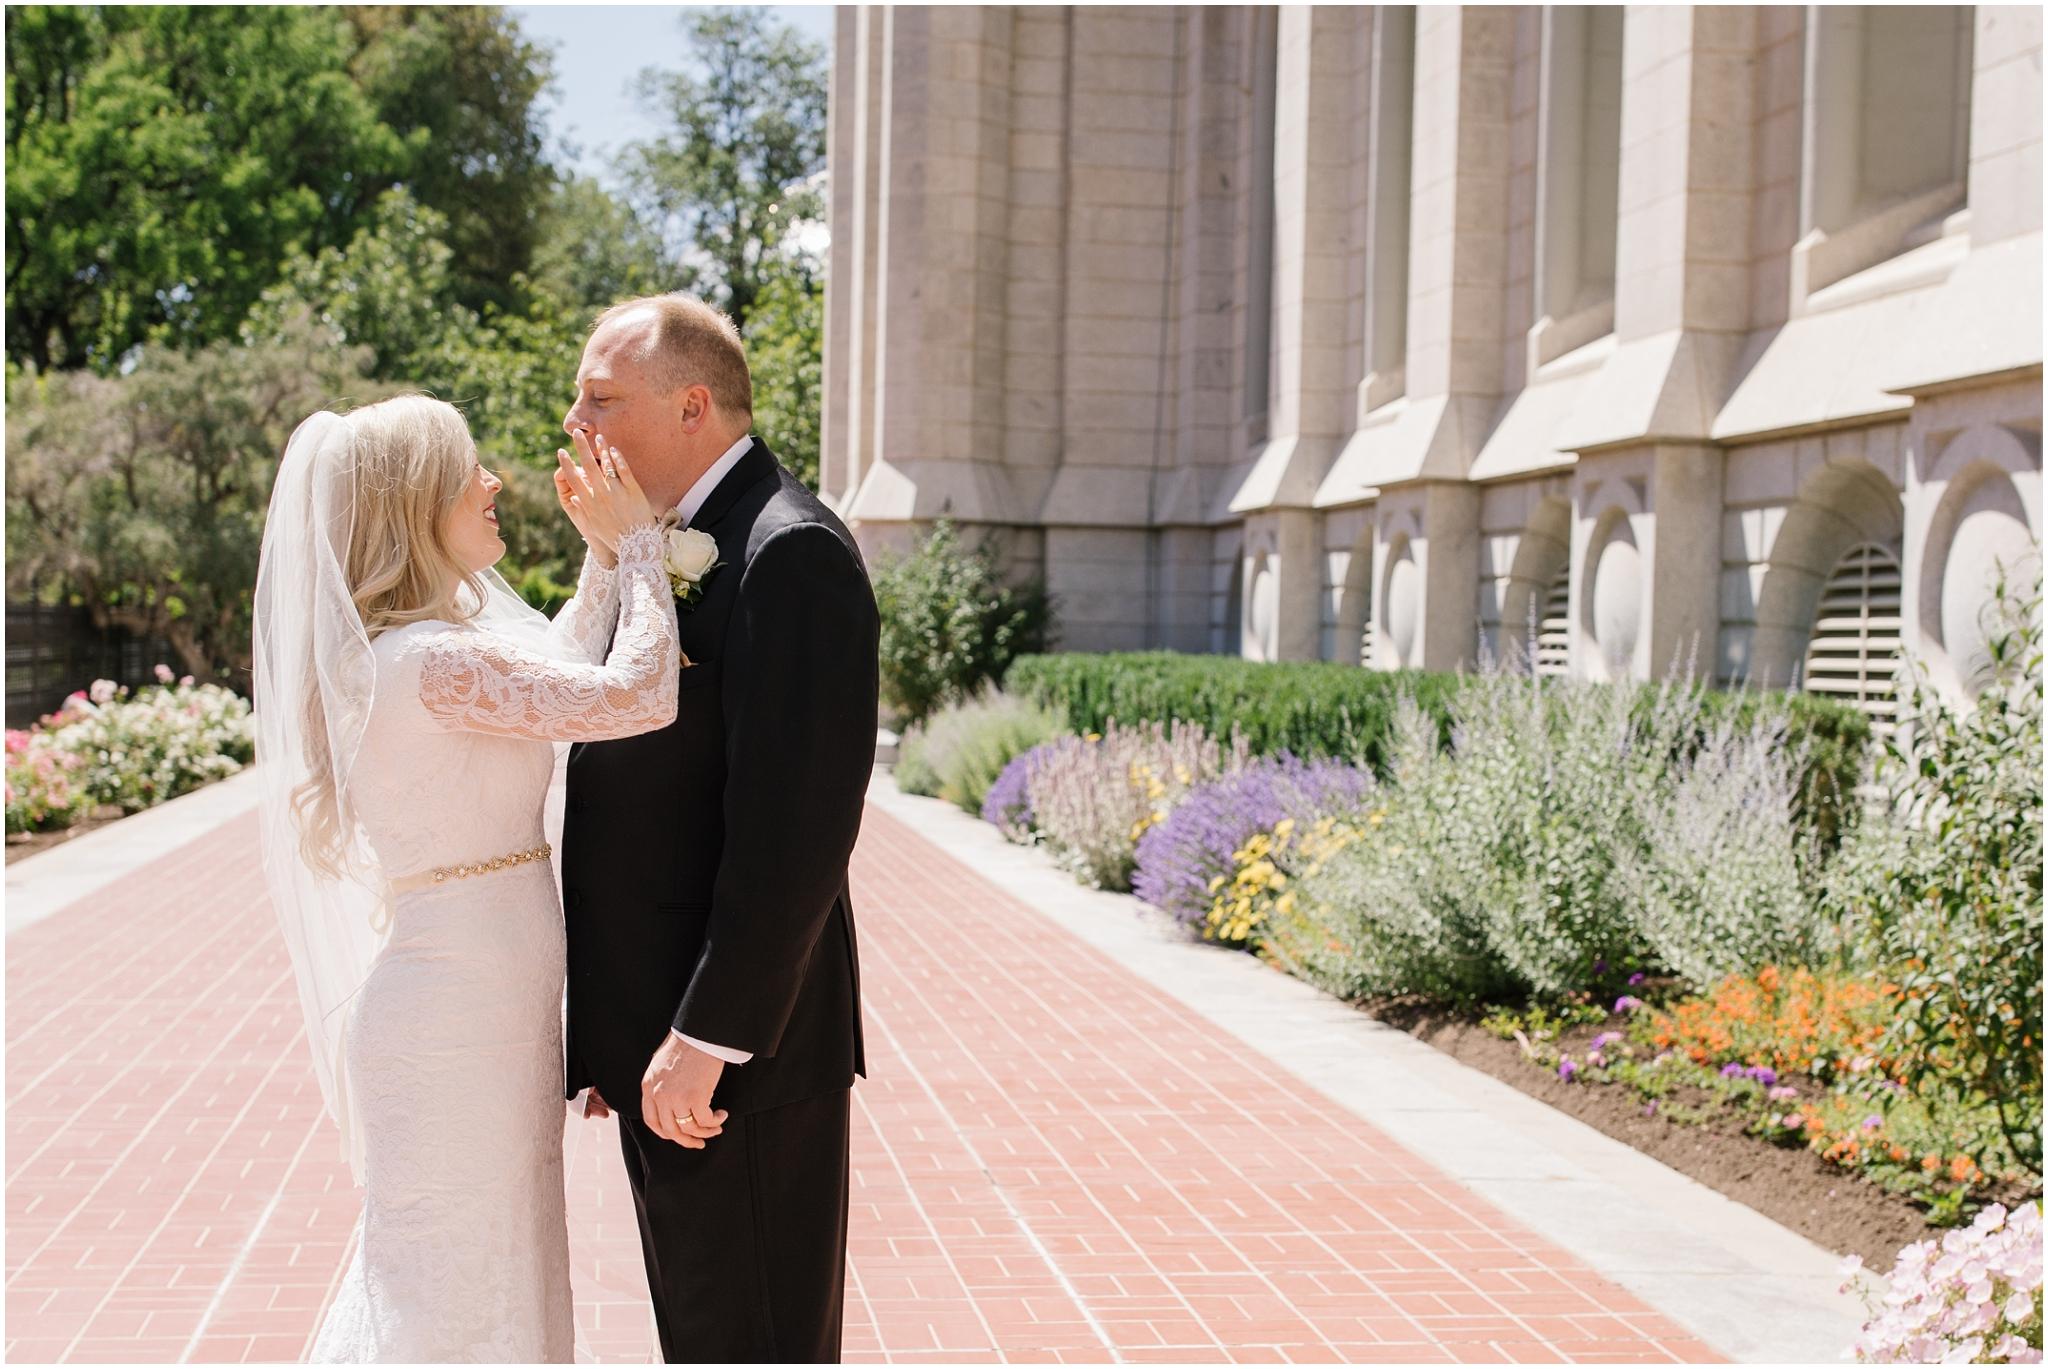 CherylandTyler-187_Lizzie-B-Imagery-Utah-Wedding-Photographer-Salt-Lake-City-Temple-Wells-Fargo-Building-Reception.jpg